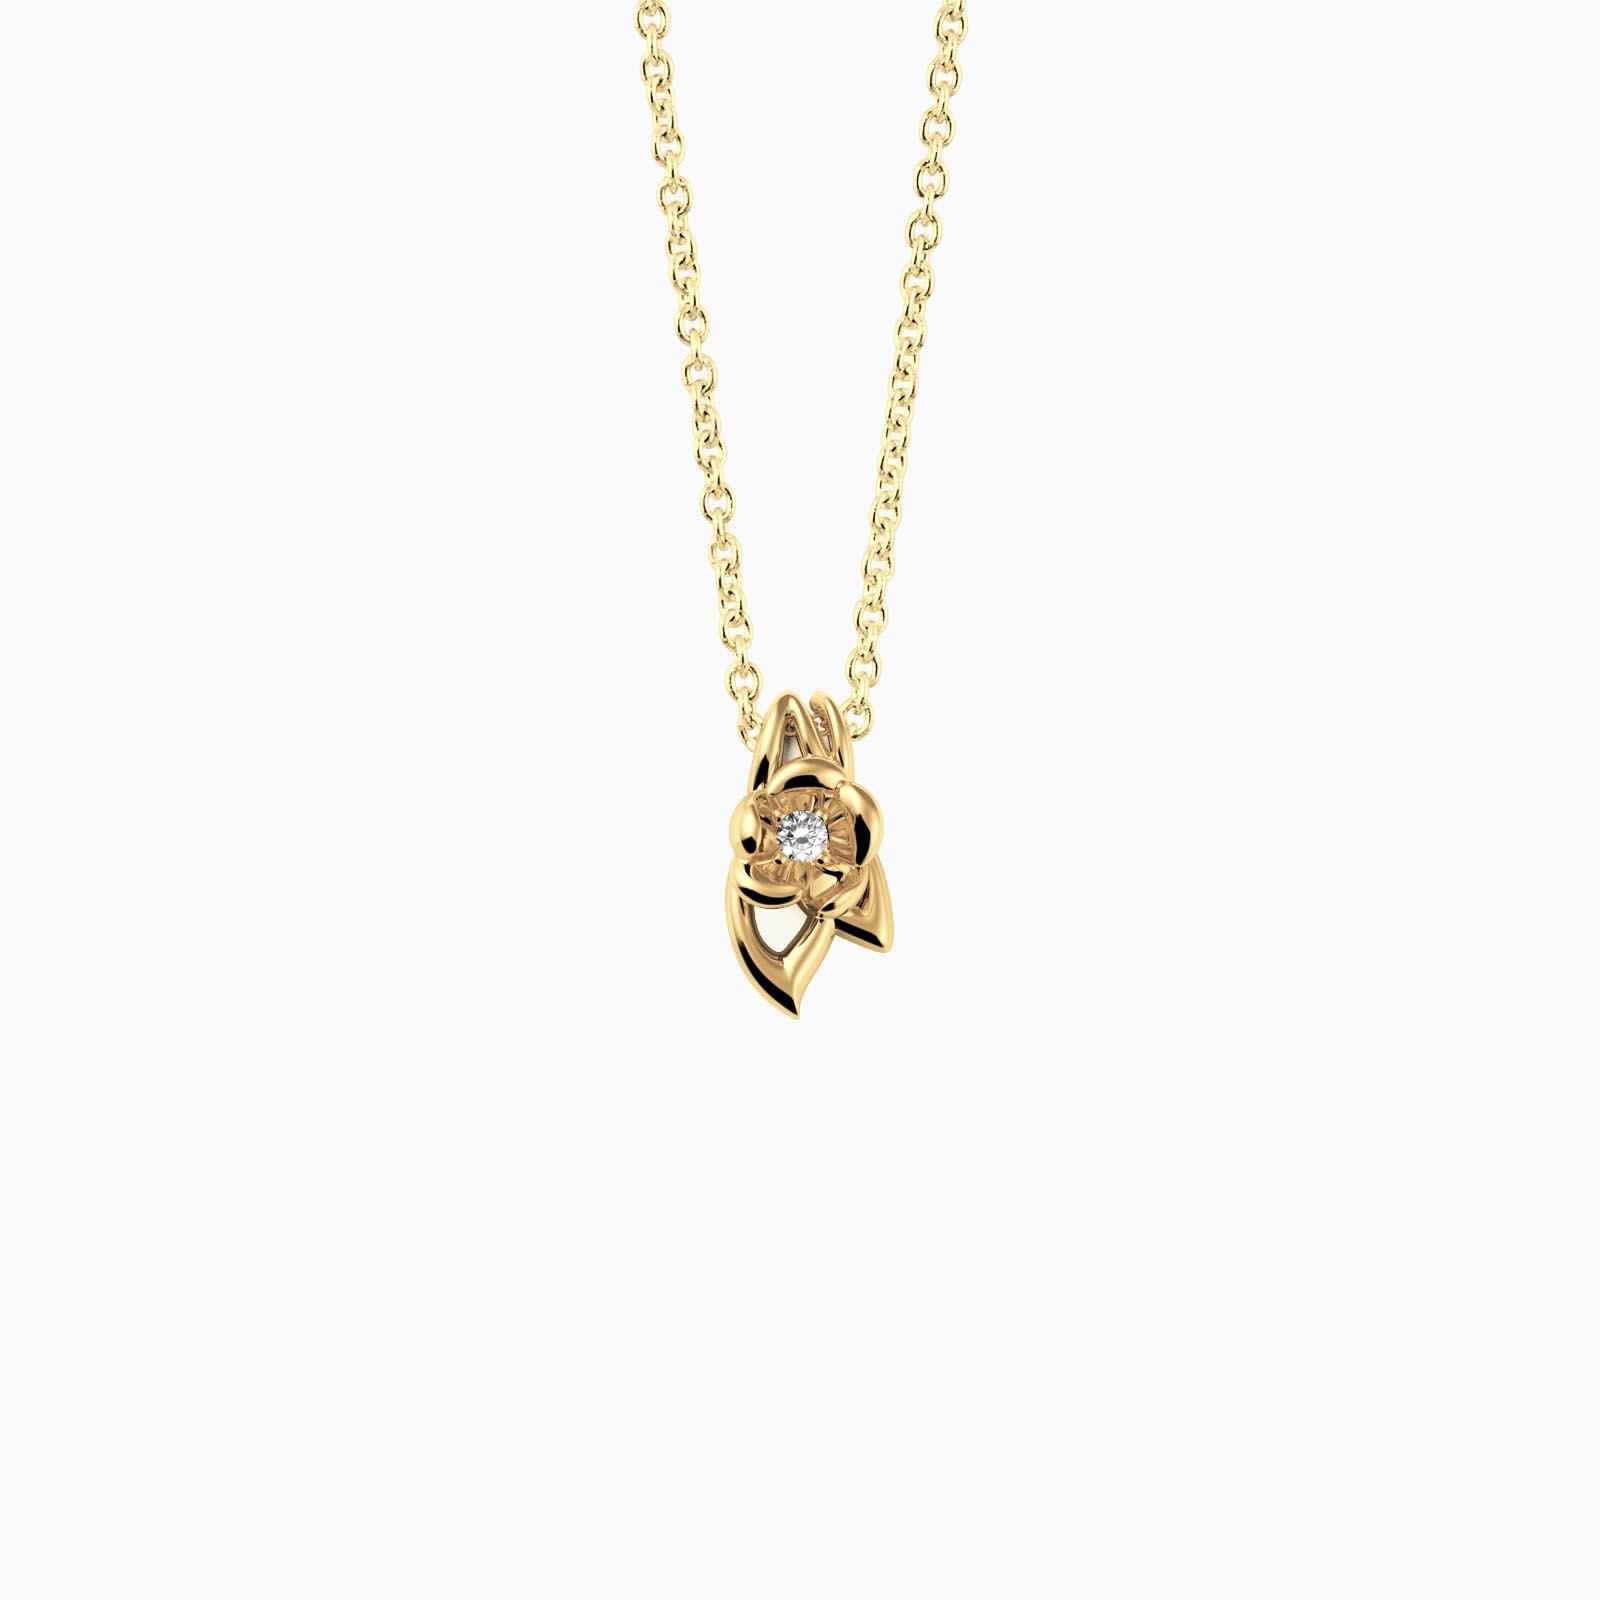 fiore Halskette Vergoldet